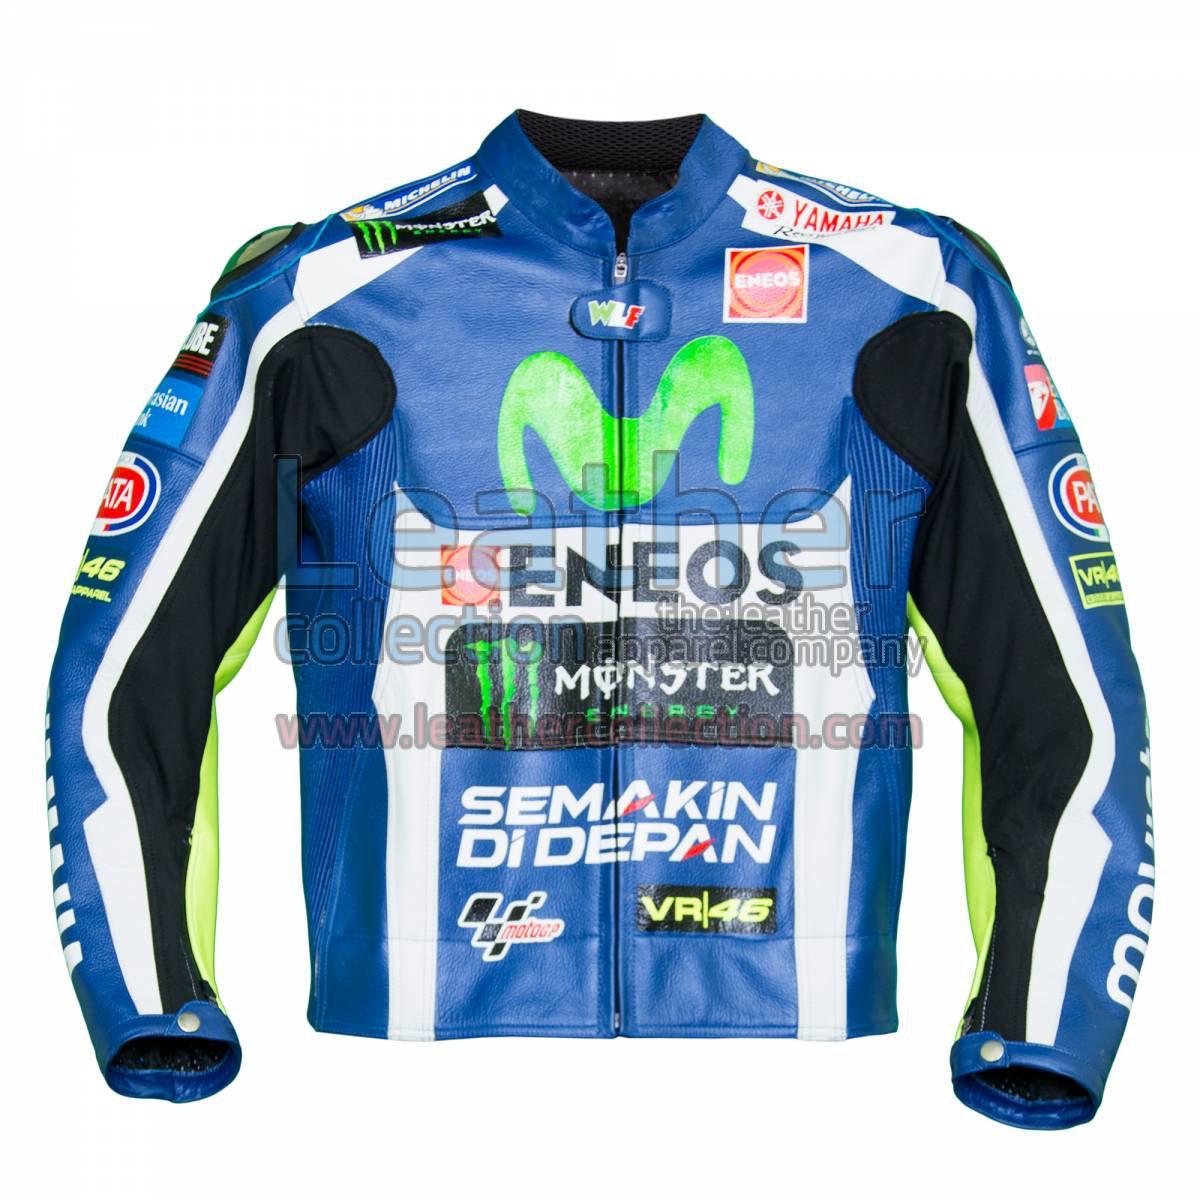 Valentino Rossi Movistar Yamaha 2016 MotoGP Race Jacket